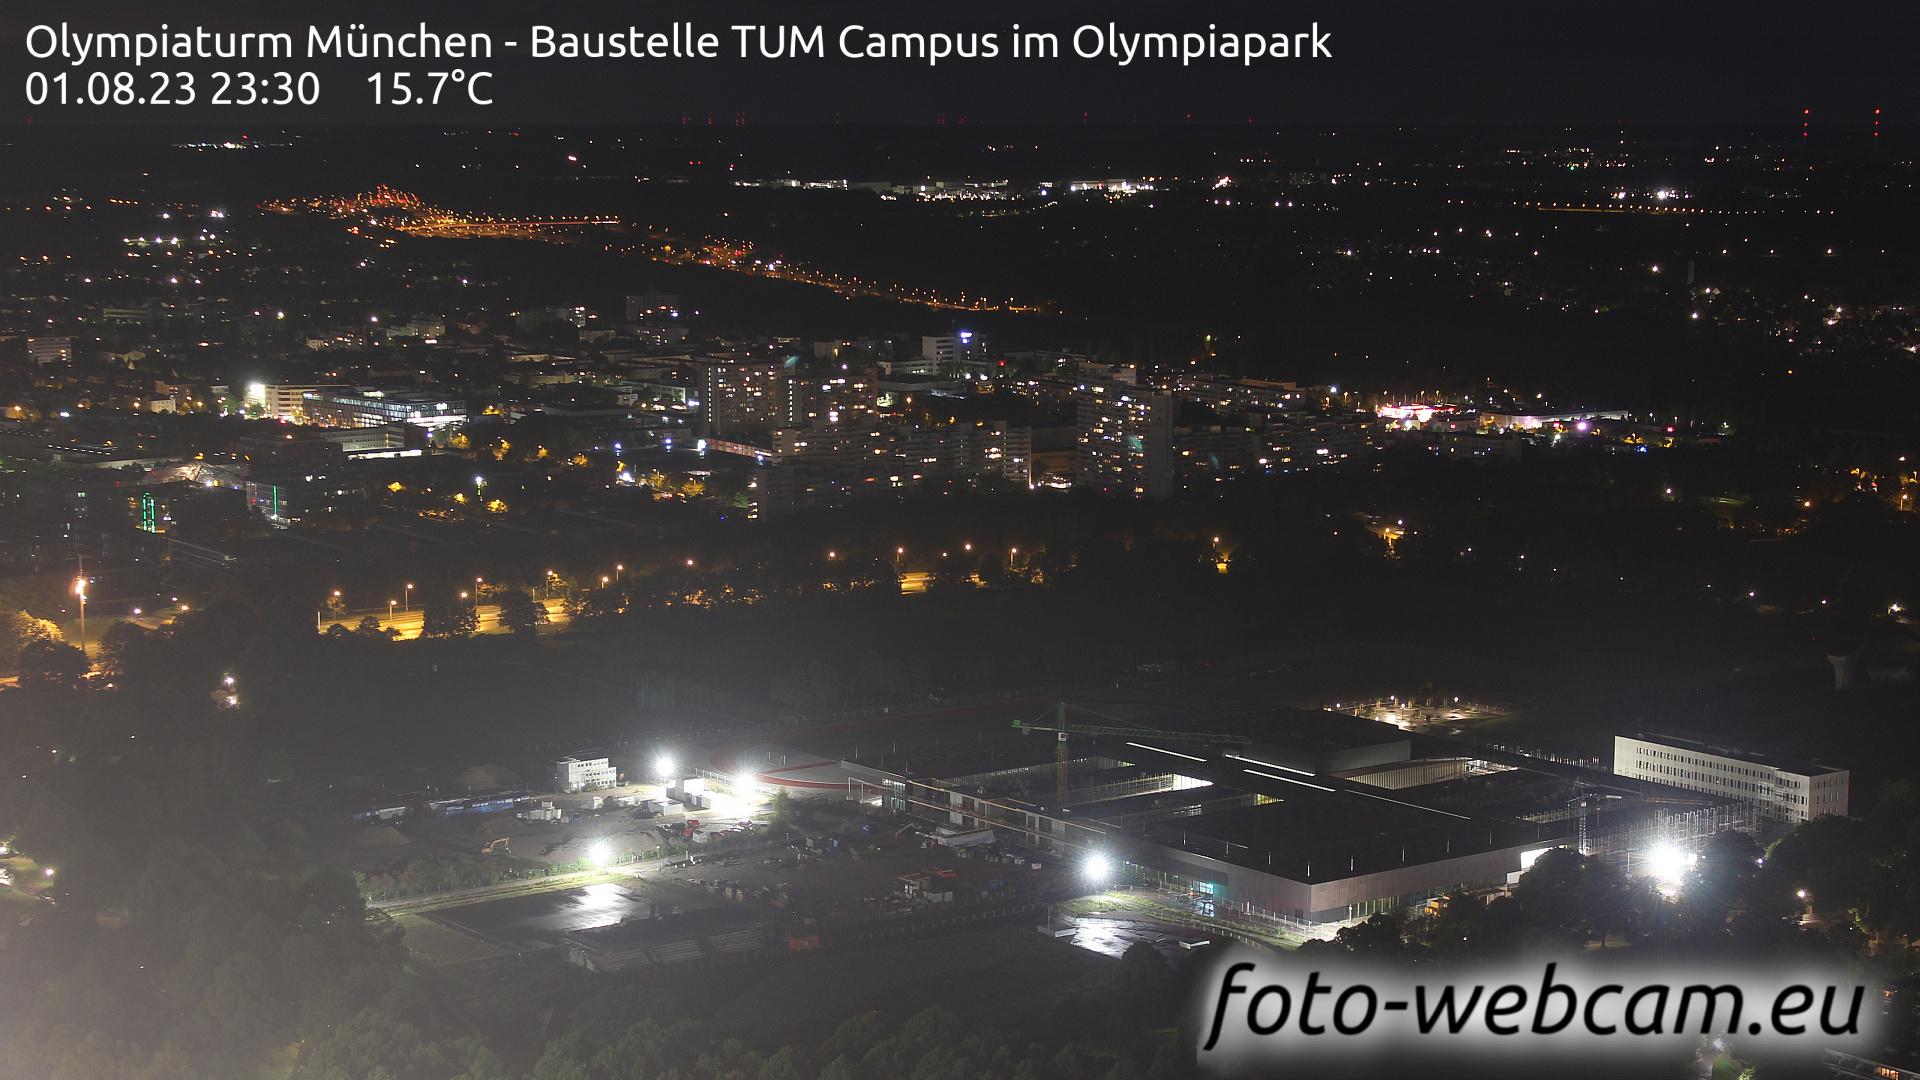 Munich Tue. 23:30